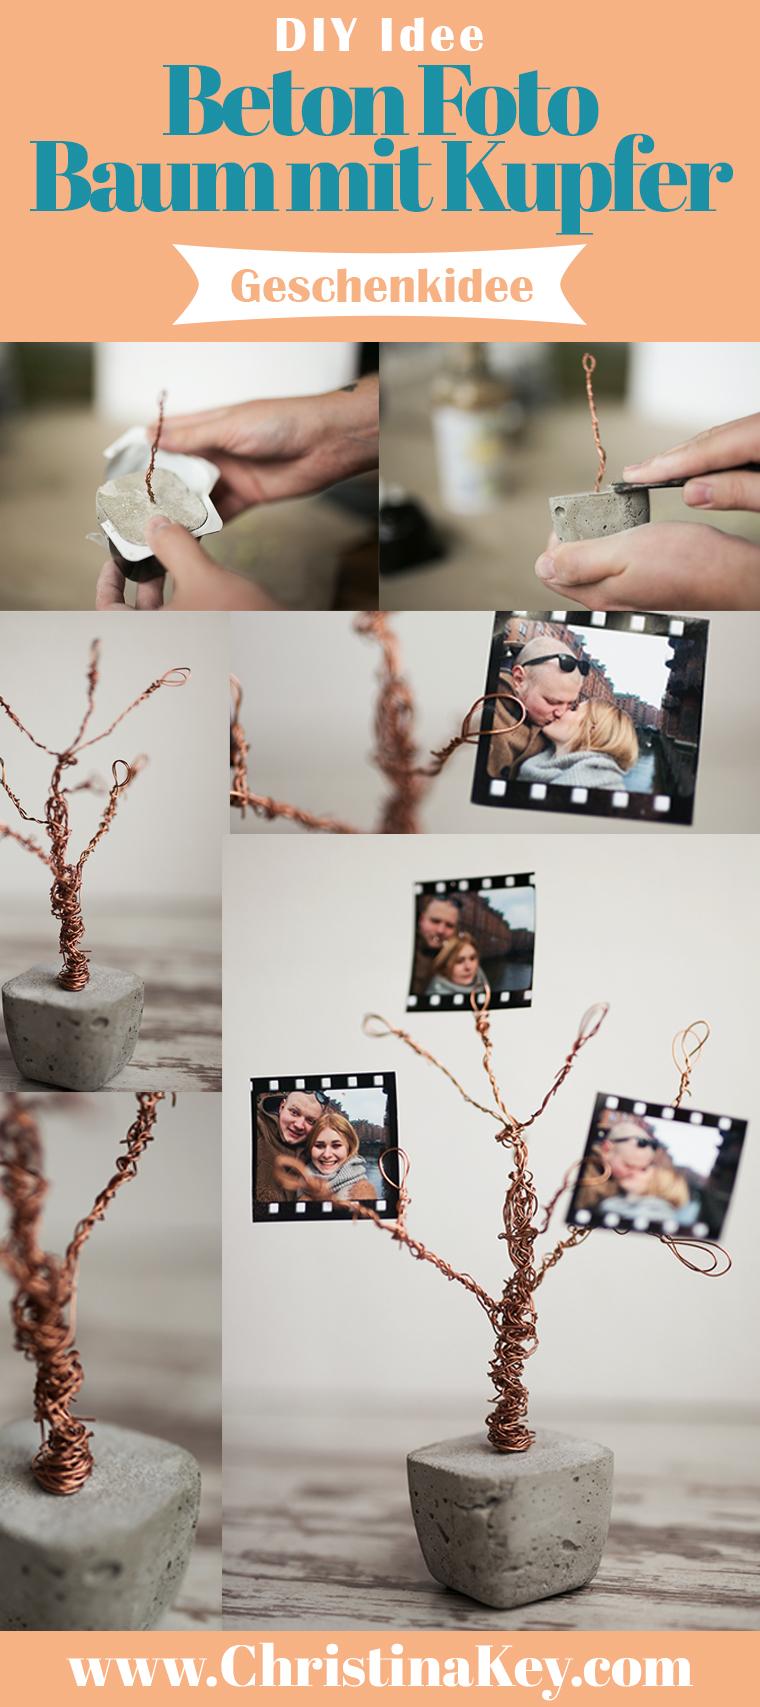 Beton Kupfer Foto Baum DIY Idee